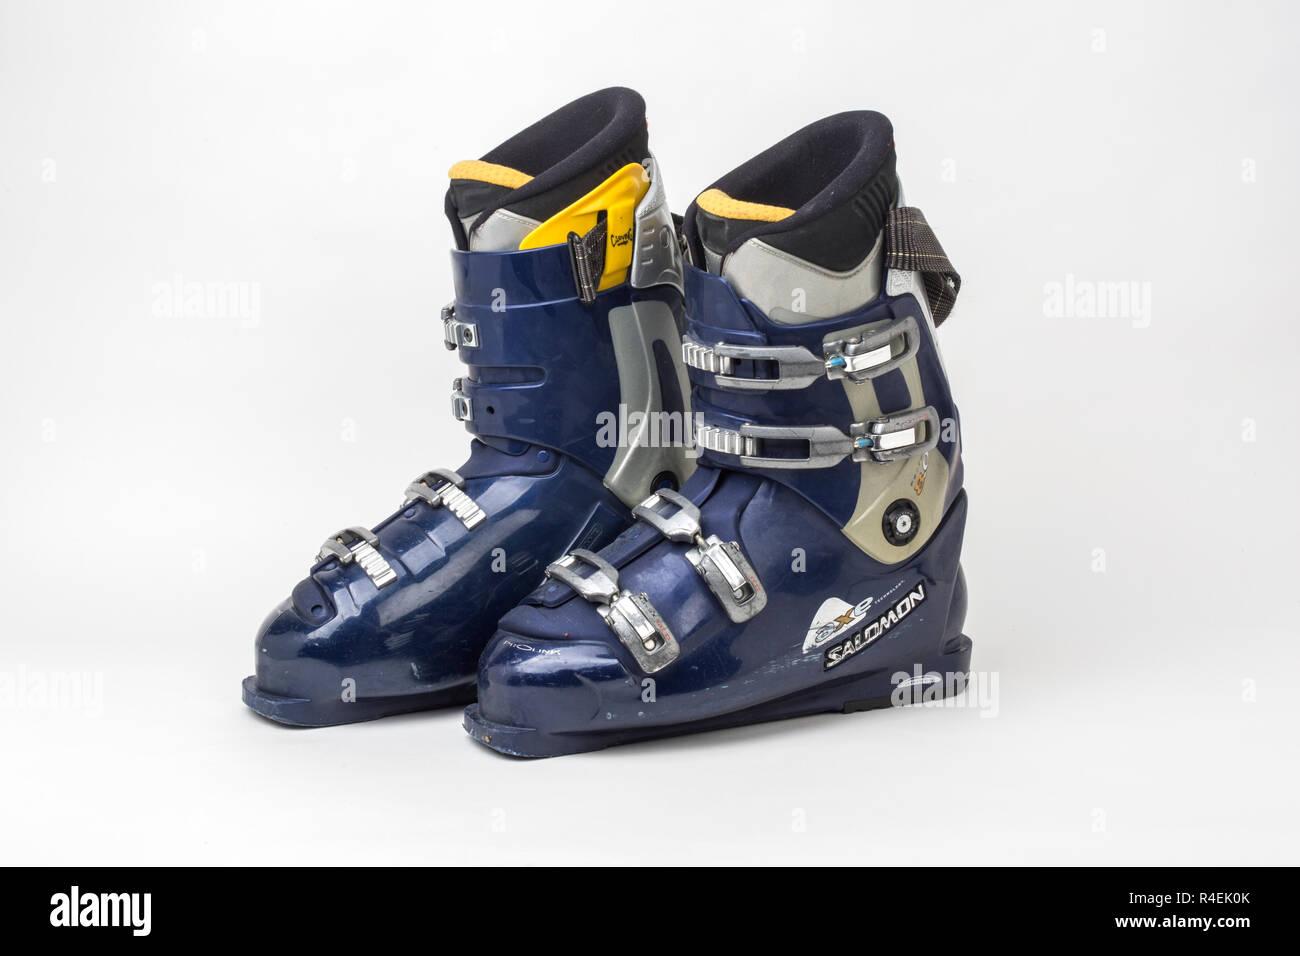 best sneakers 40730 45eeb Scarponi Da Sci Immagini & Scarponi Da Sci Fotos Stock - Alamy